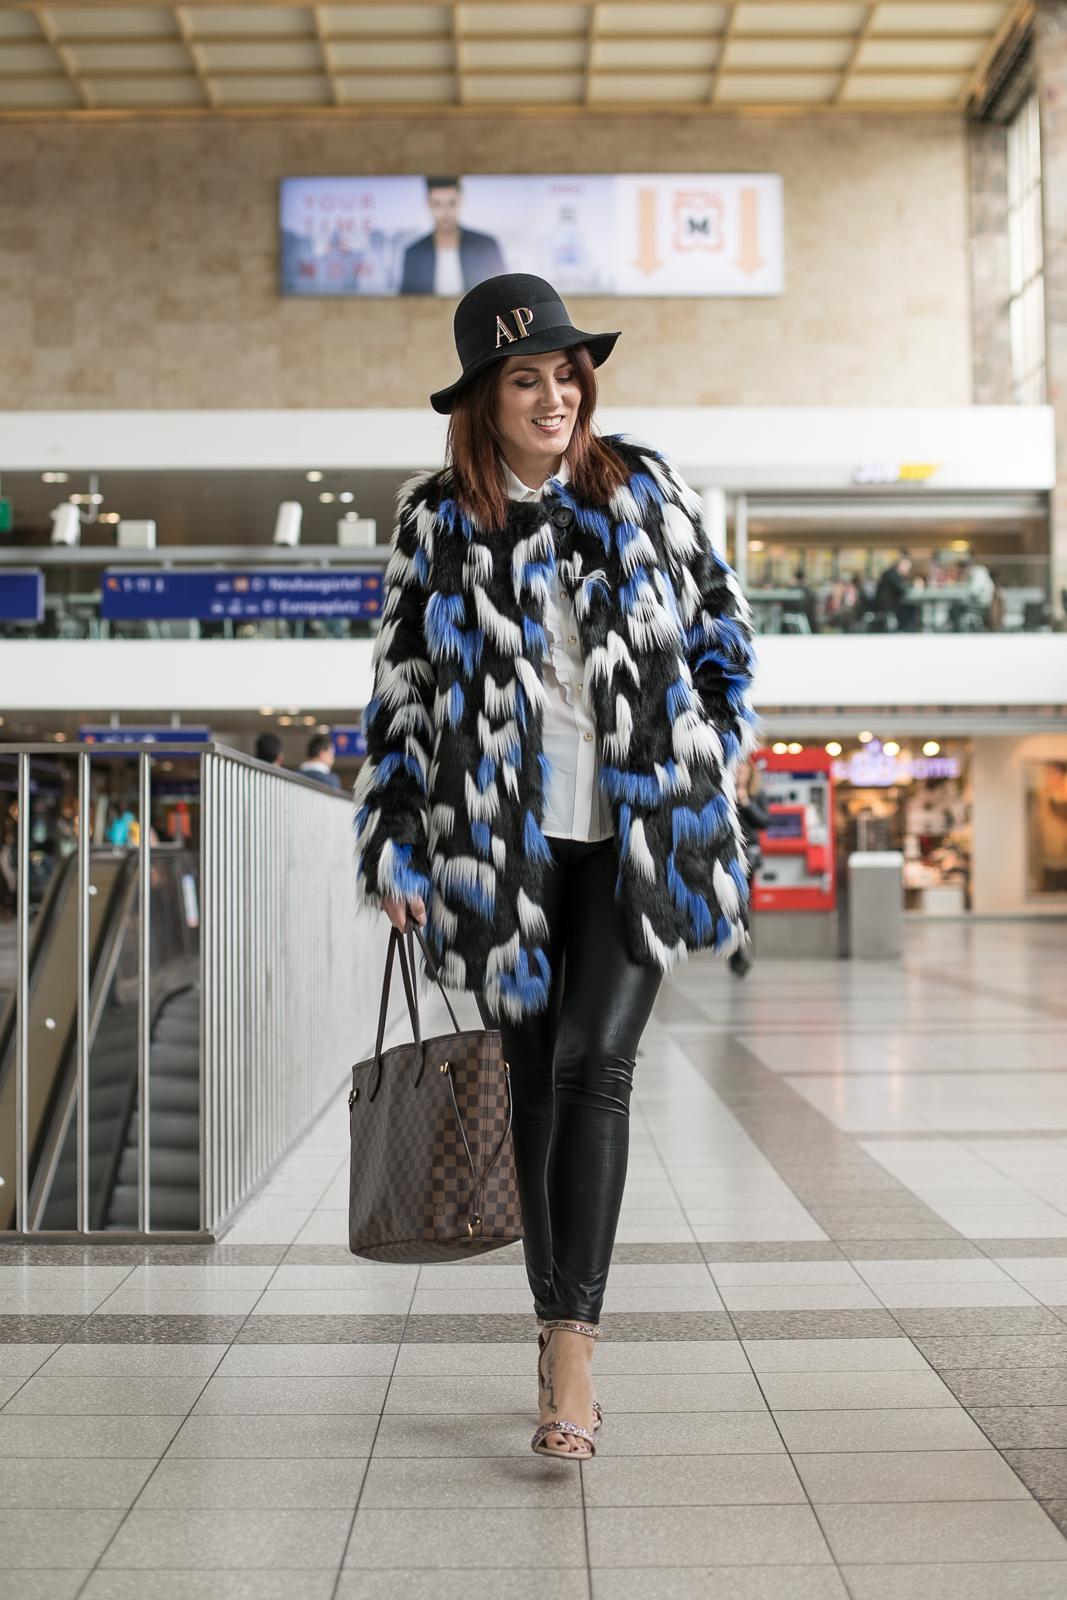 1600-shooting-nadja-nemetz-nadjanemetz-beauty-fashion-vienna-blogger-austrianblogger-violet-fleur-violetfleur-beautyblogger-fashionblogger-hse24-020